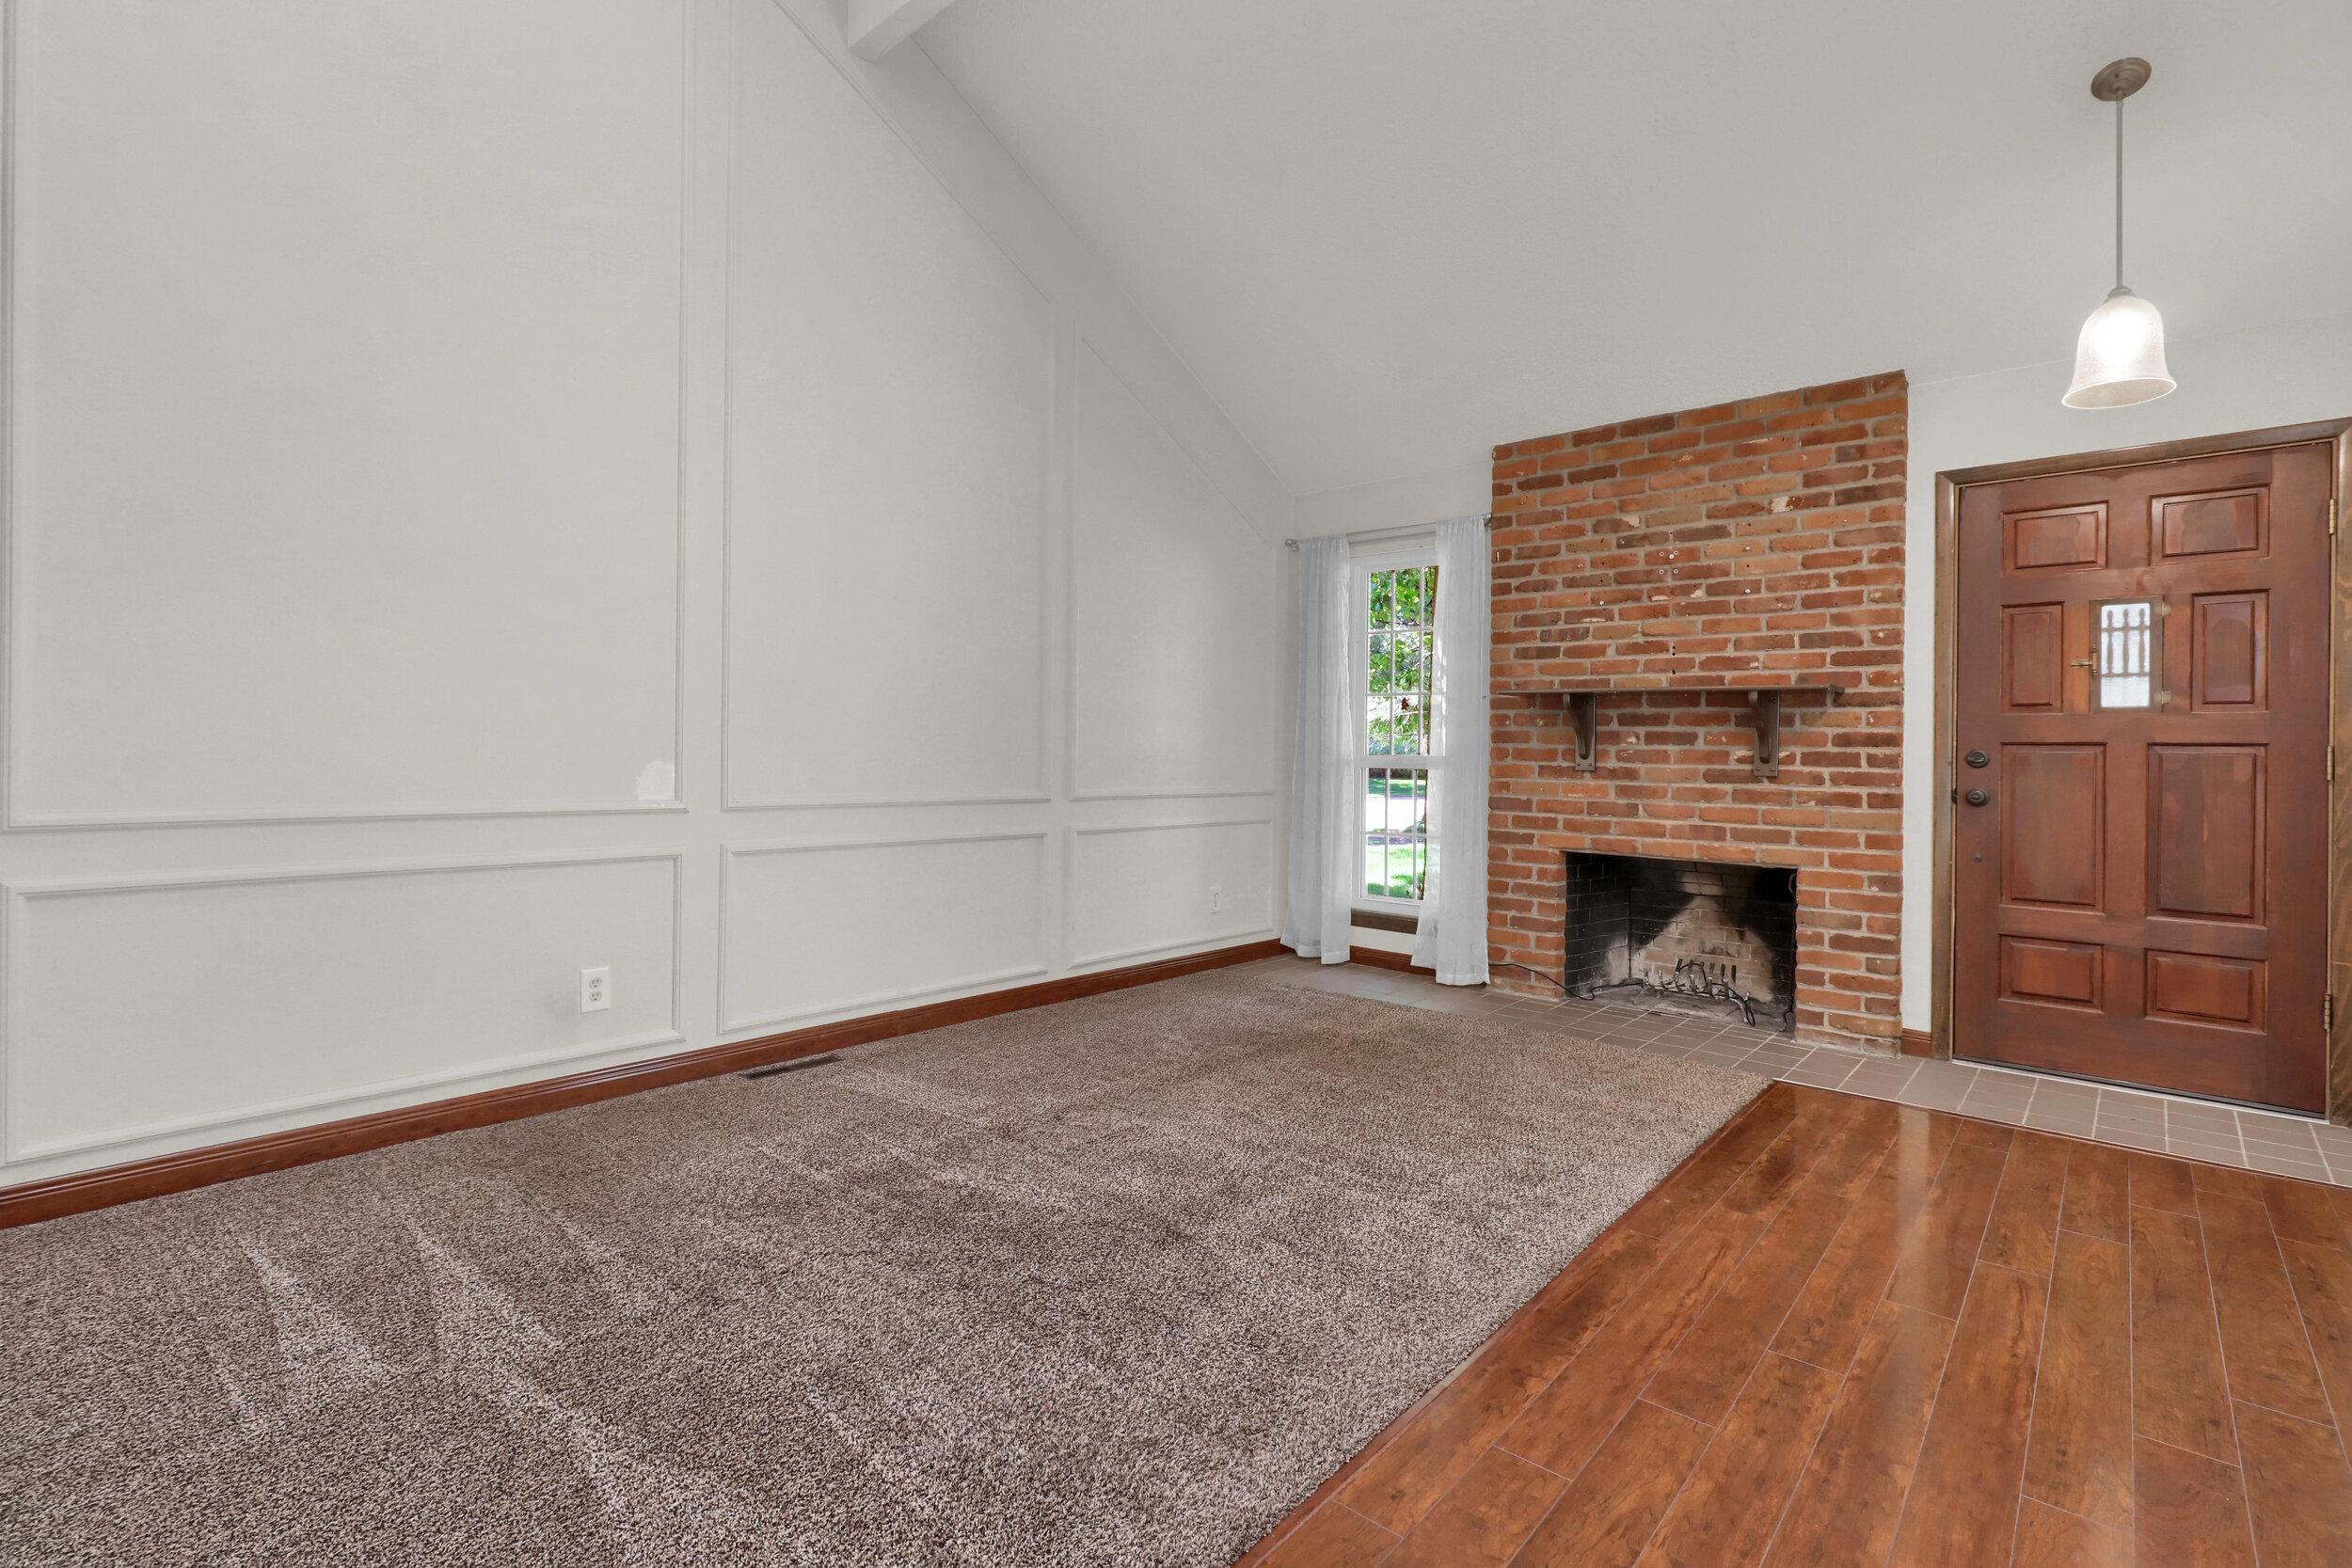 9970 Grove Street Unit B-print-003-005-Living Room-4200x2800-300dpi.jpg